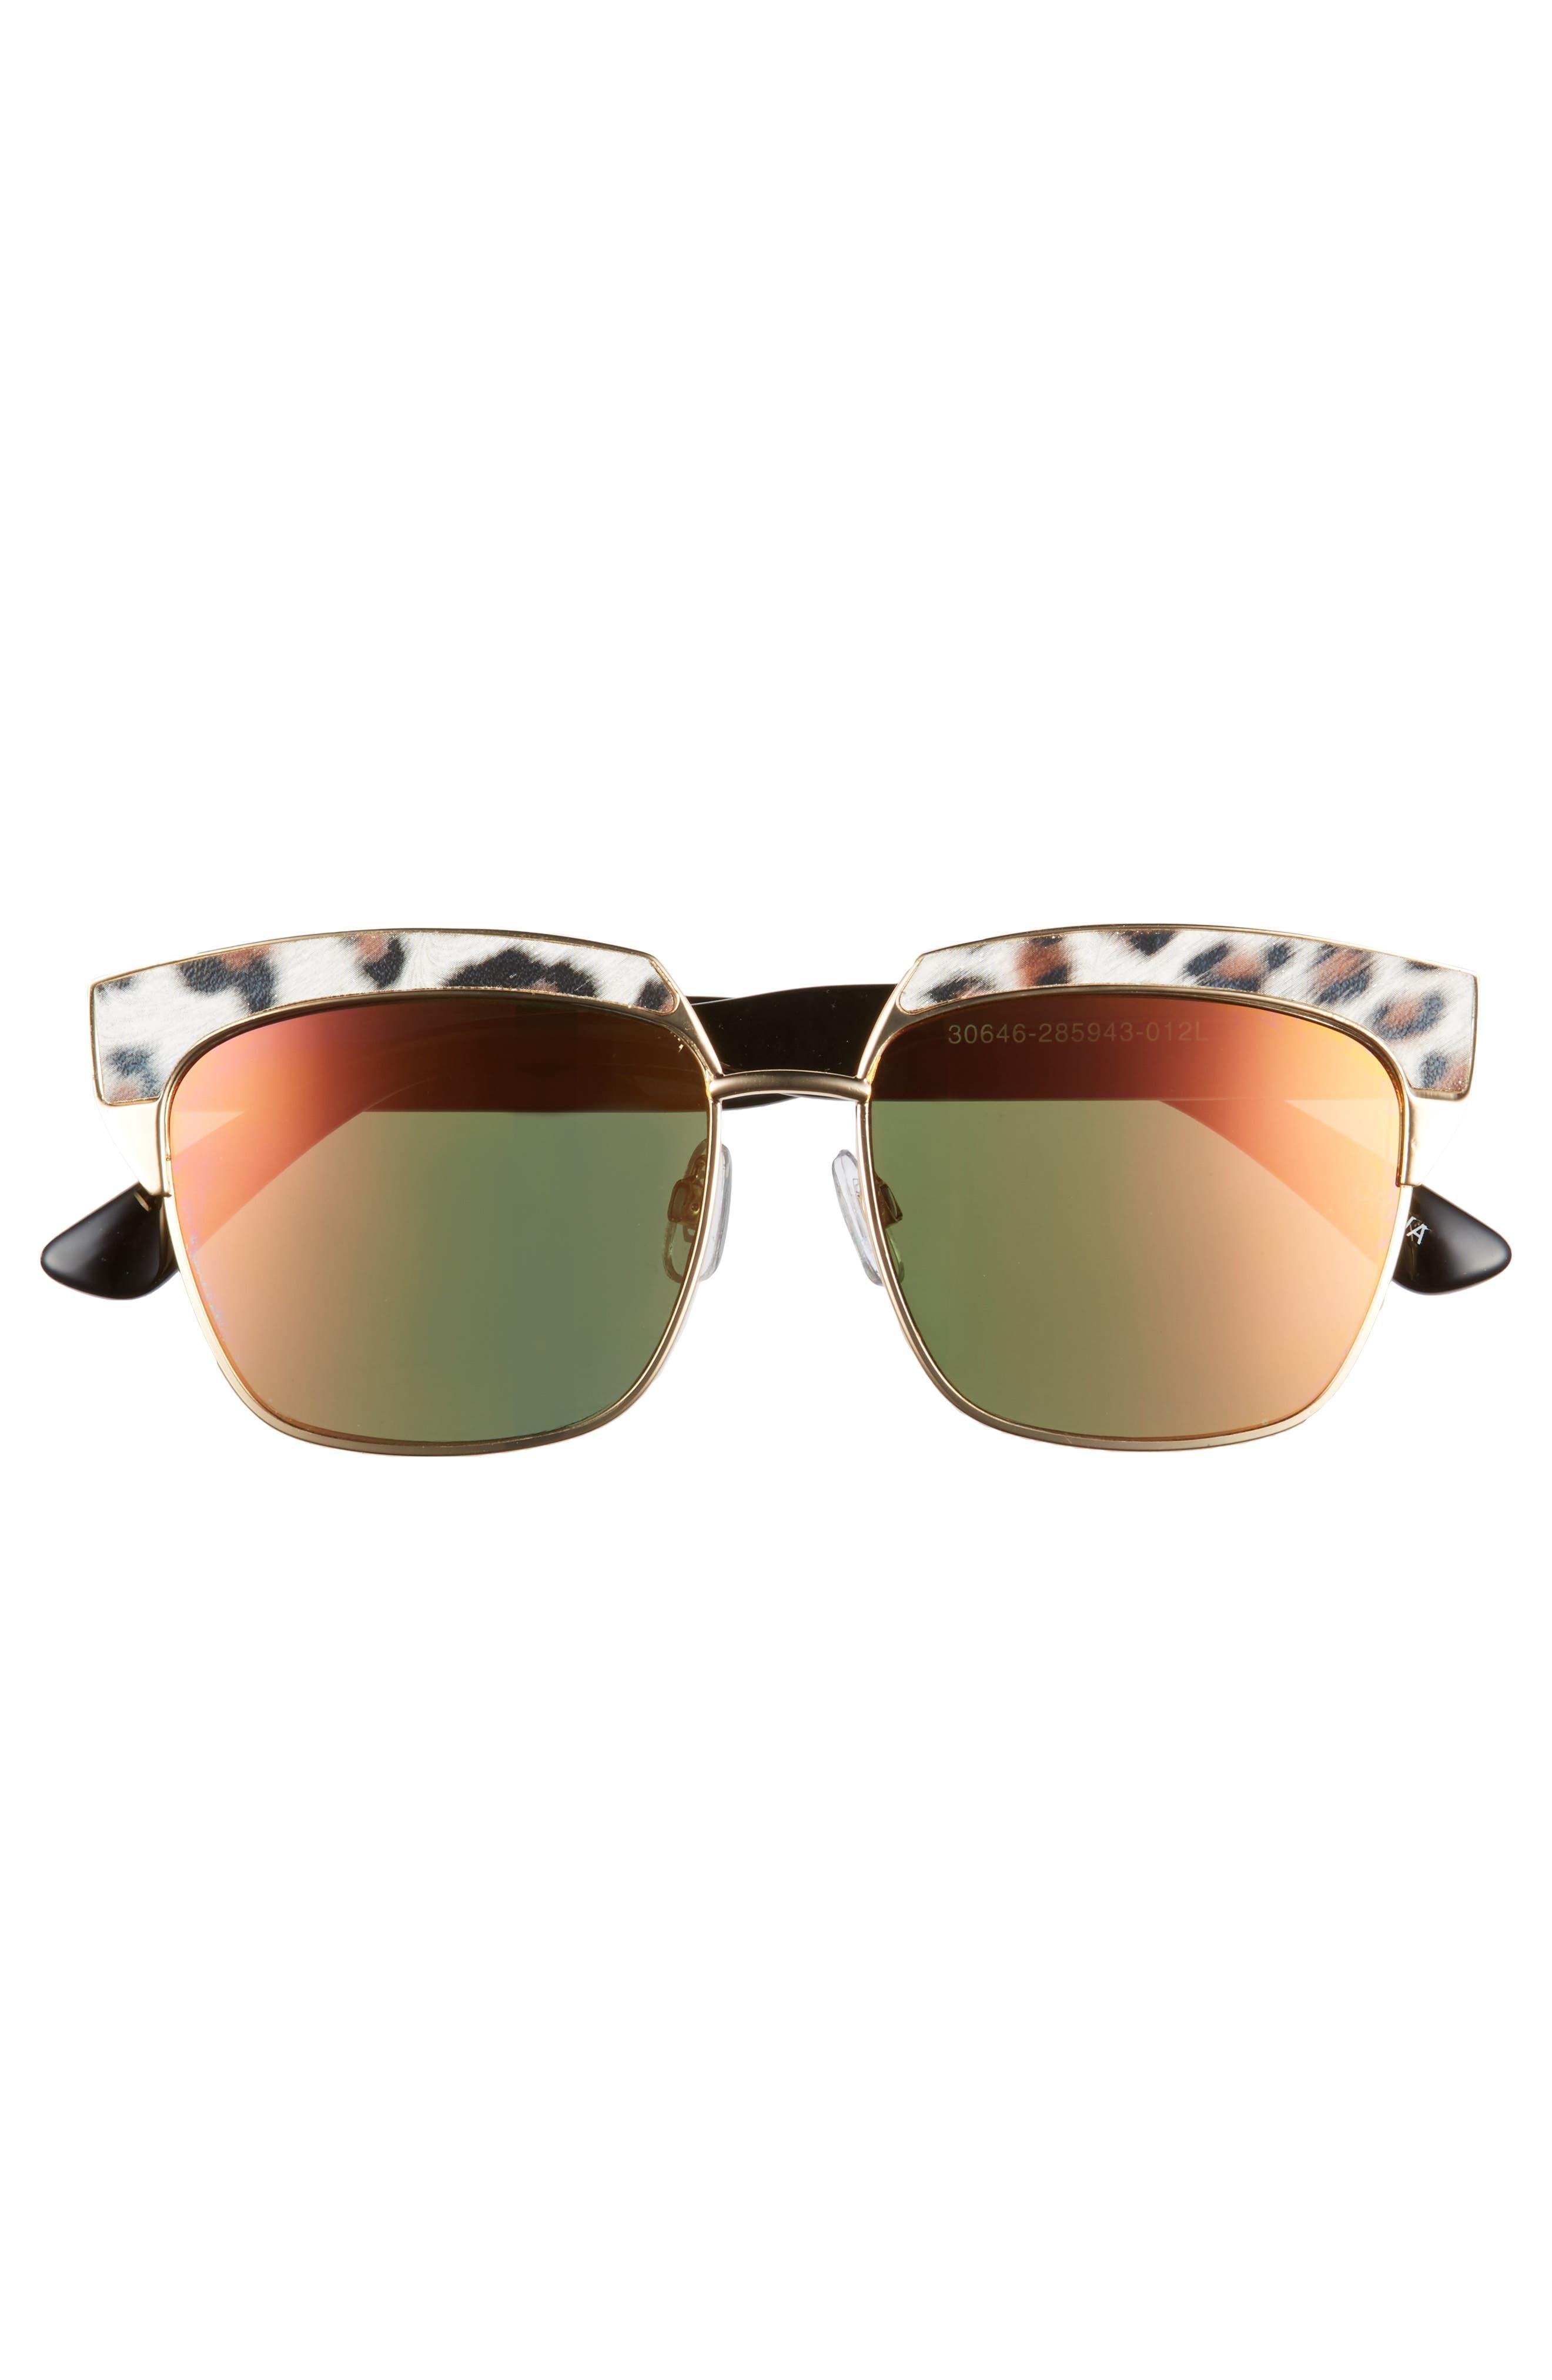 Leopard Print Top Bar Sunglasses,                             Alternate thumbnail 3, color,                             Multi/ Gold